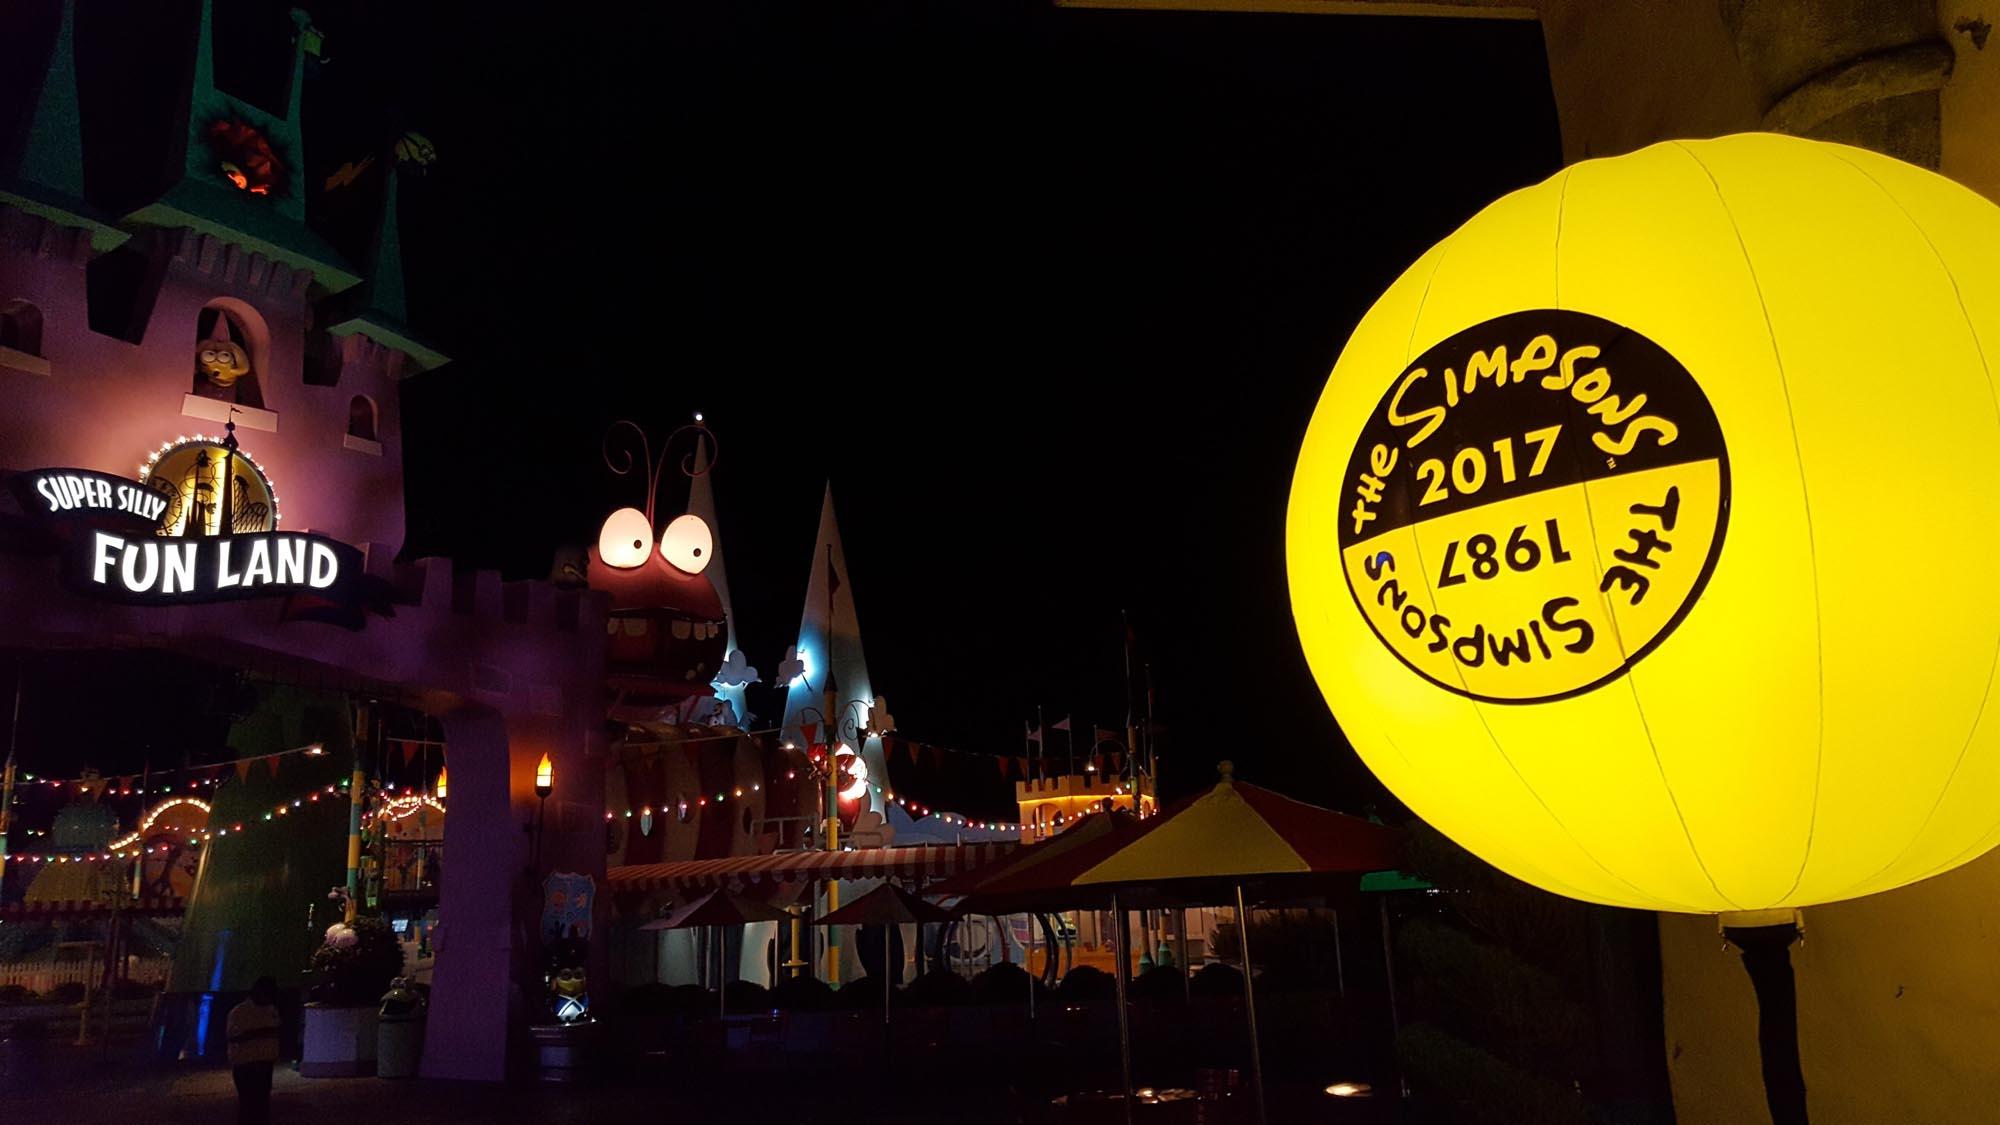 Simpsons-b-1-uai-2880x1620.jpg